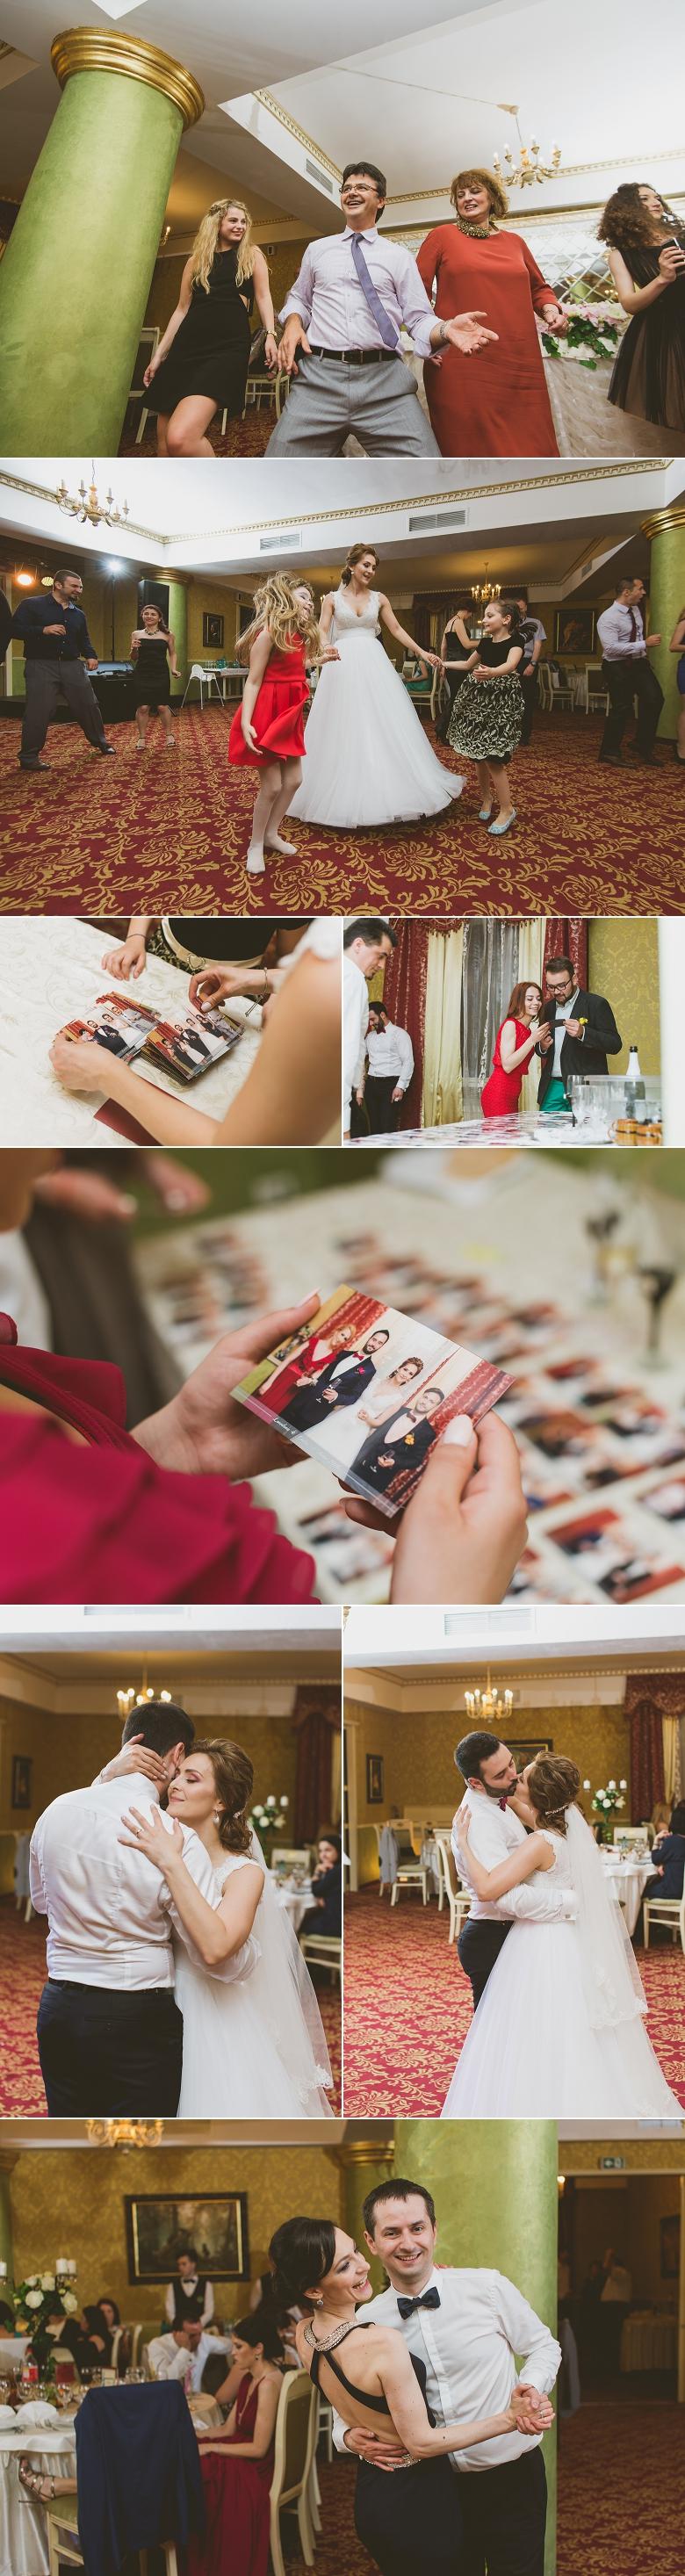 foto_video_nunta_cluj_fotograf_profesionist_nunta_cluj_dej_bistrita_nasaud_ 12